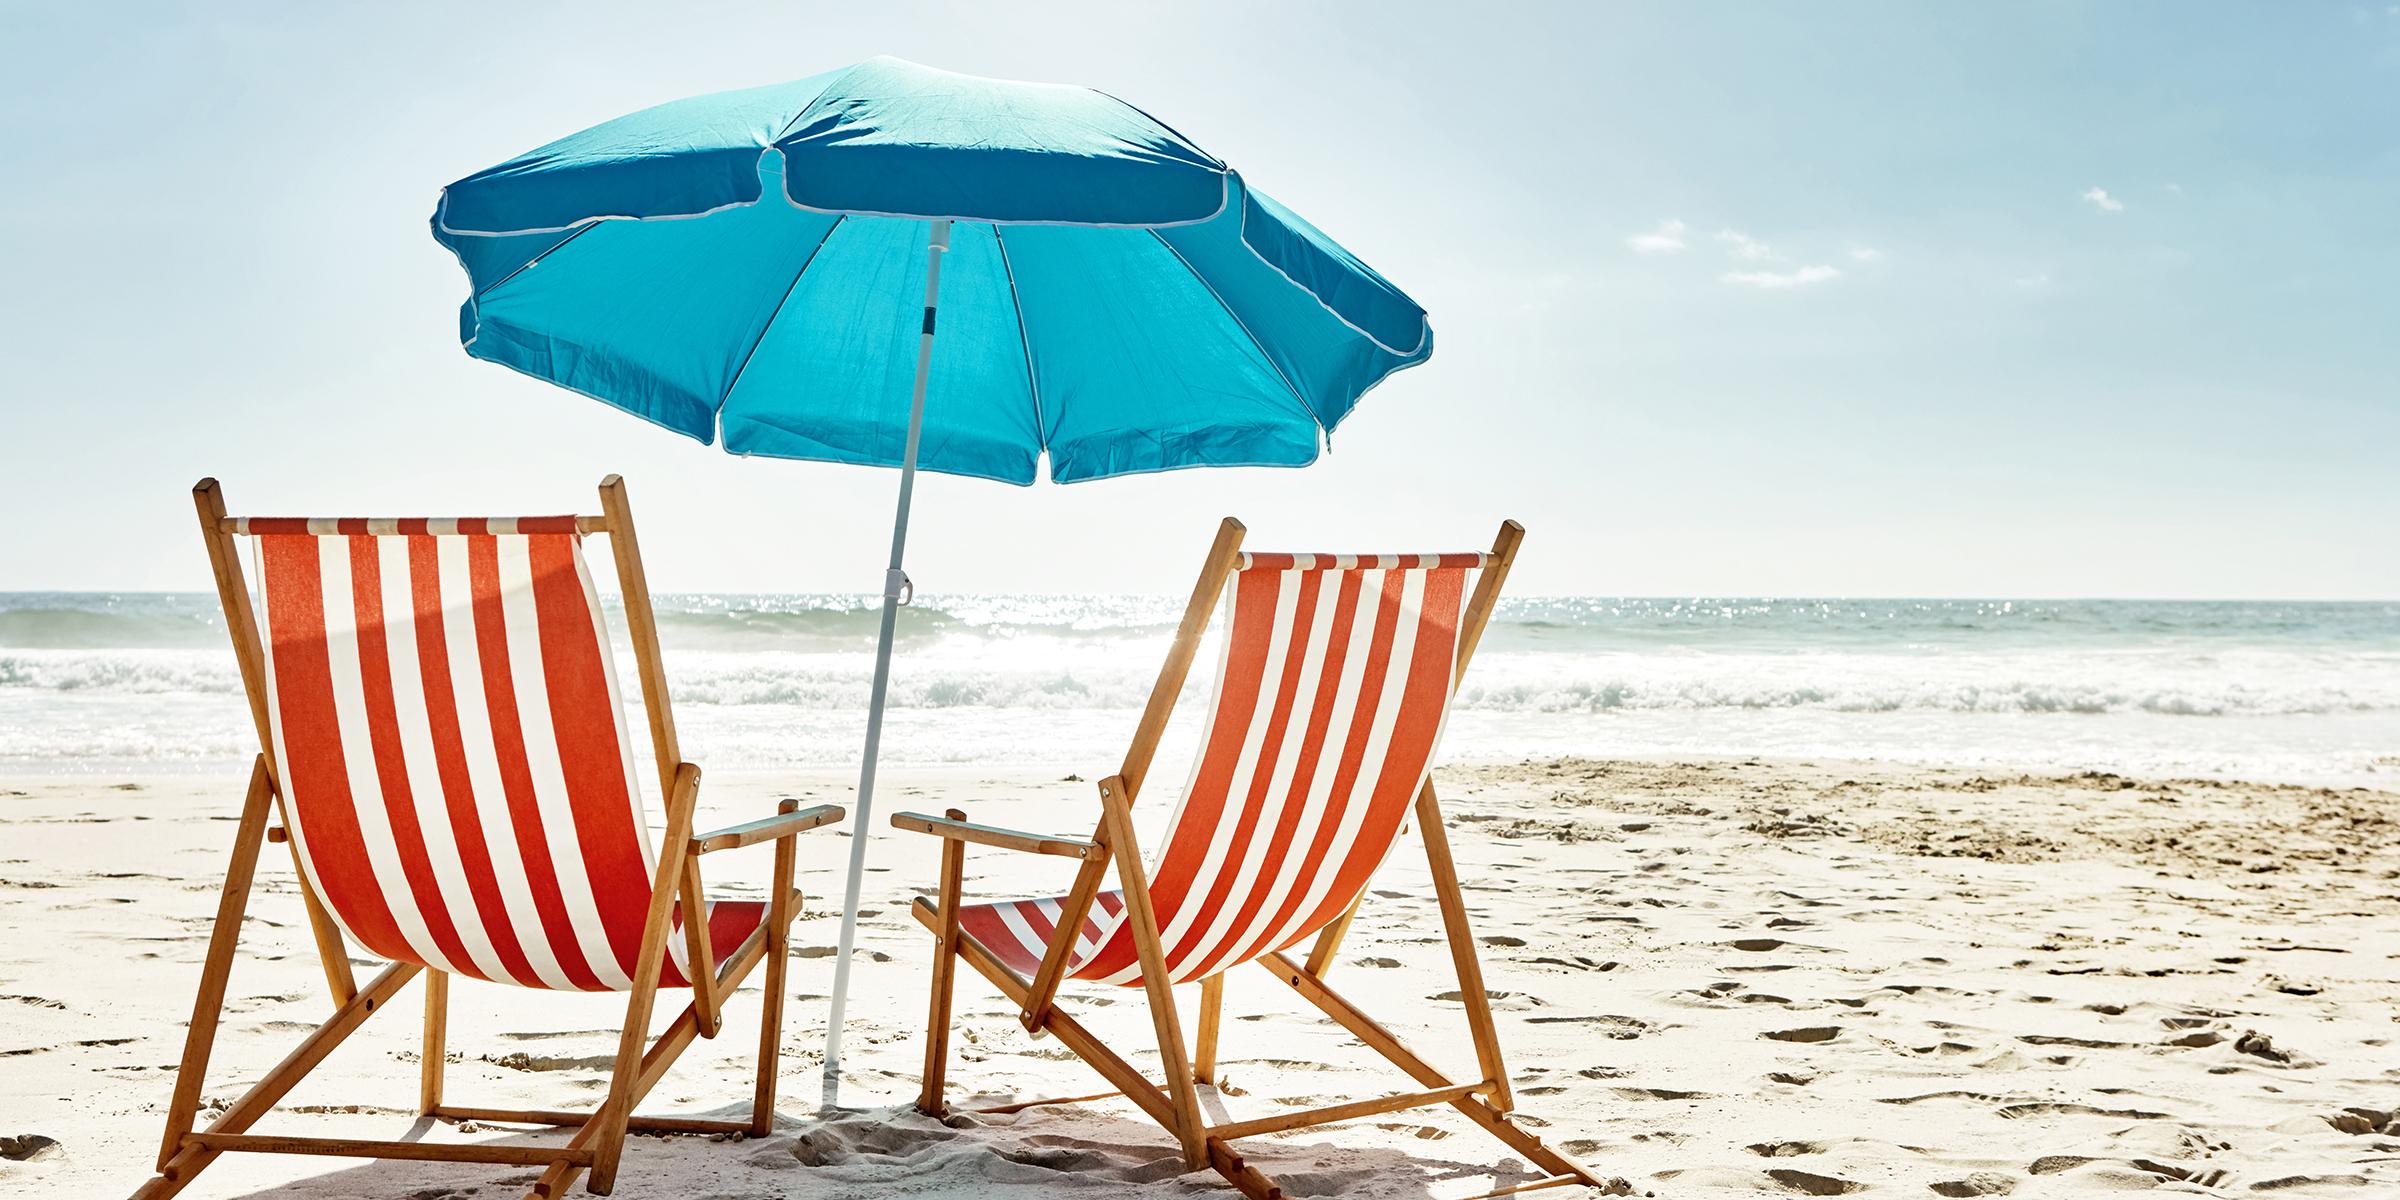 Leasure Fiberglass Portable Beach Umbrellas Throughout Well Known The Best Beach Umbrellas (View 15 of 20)